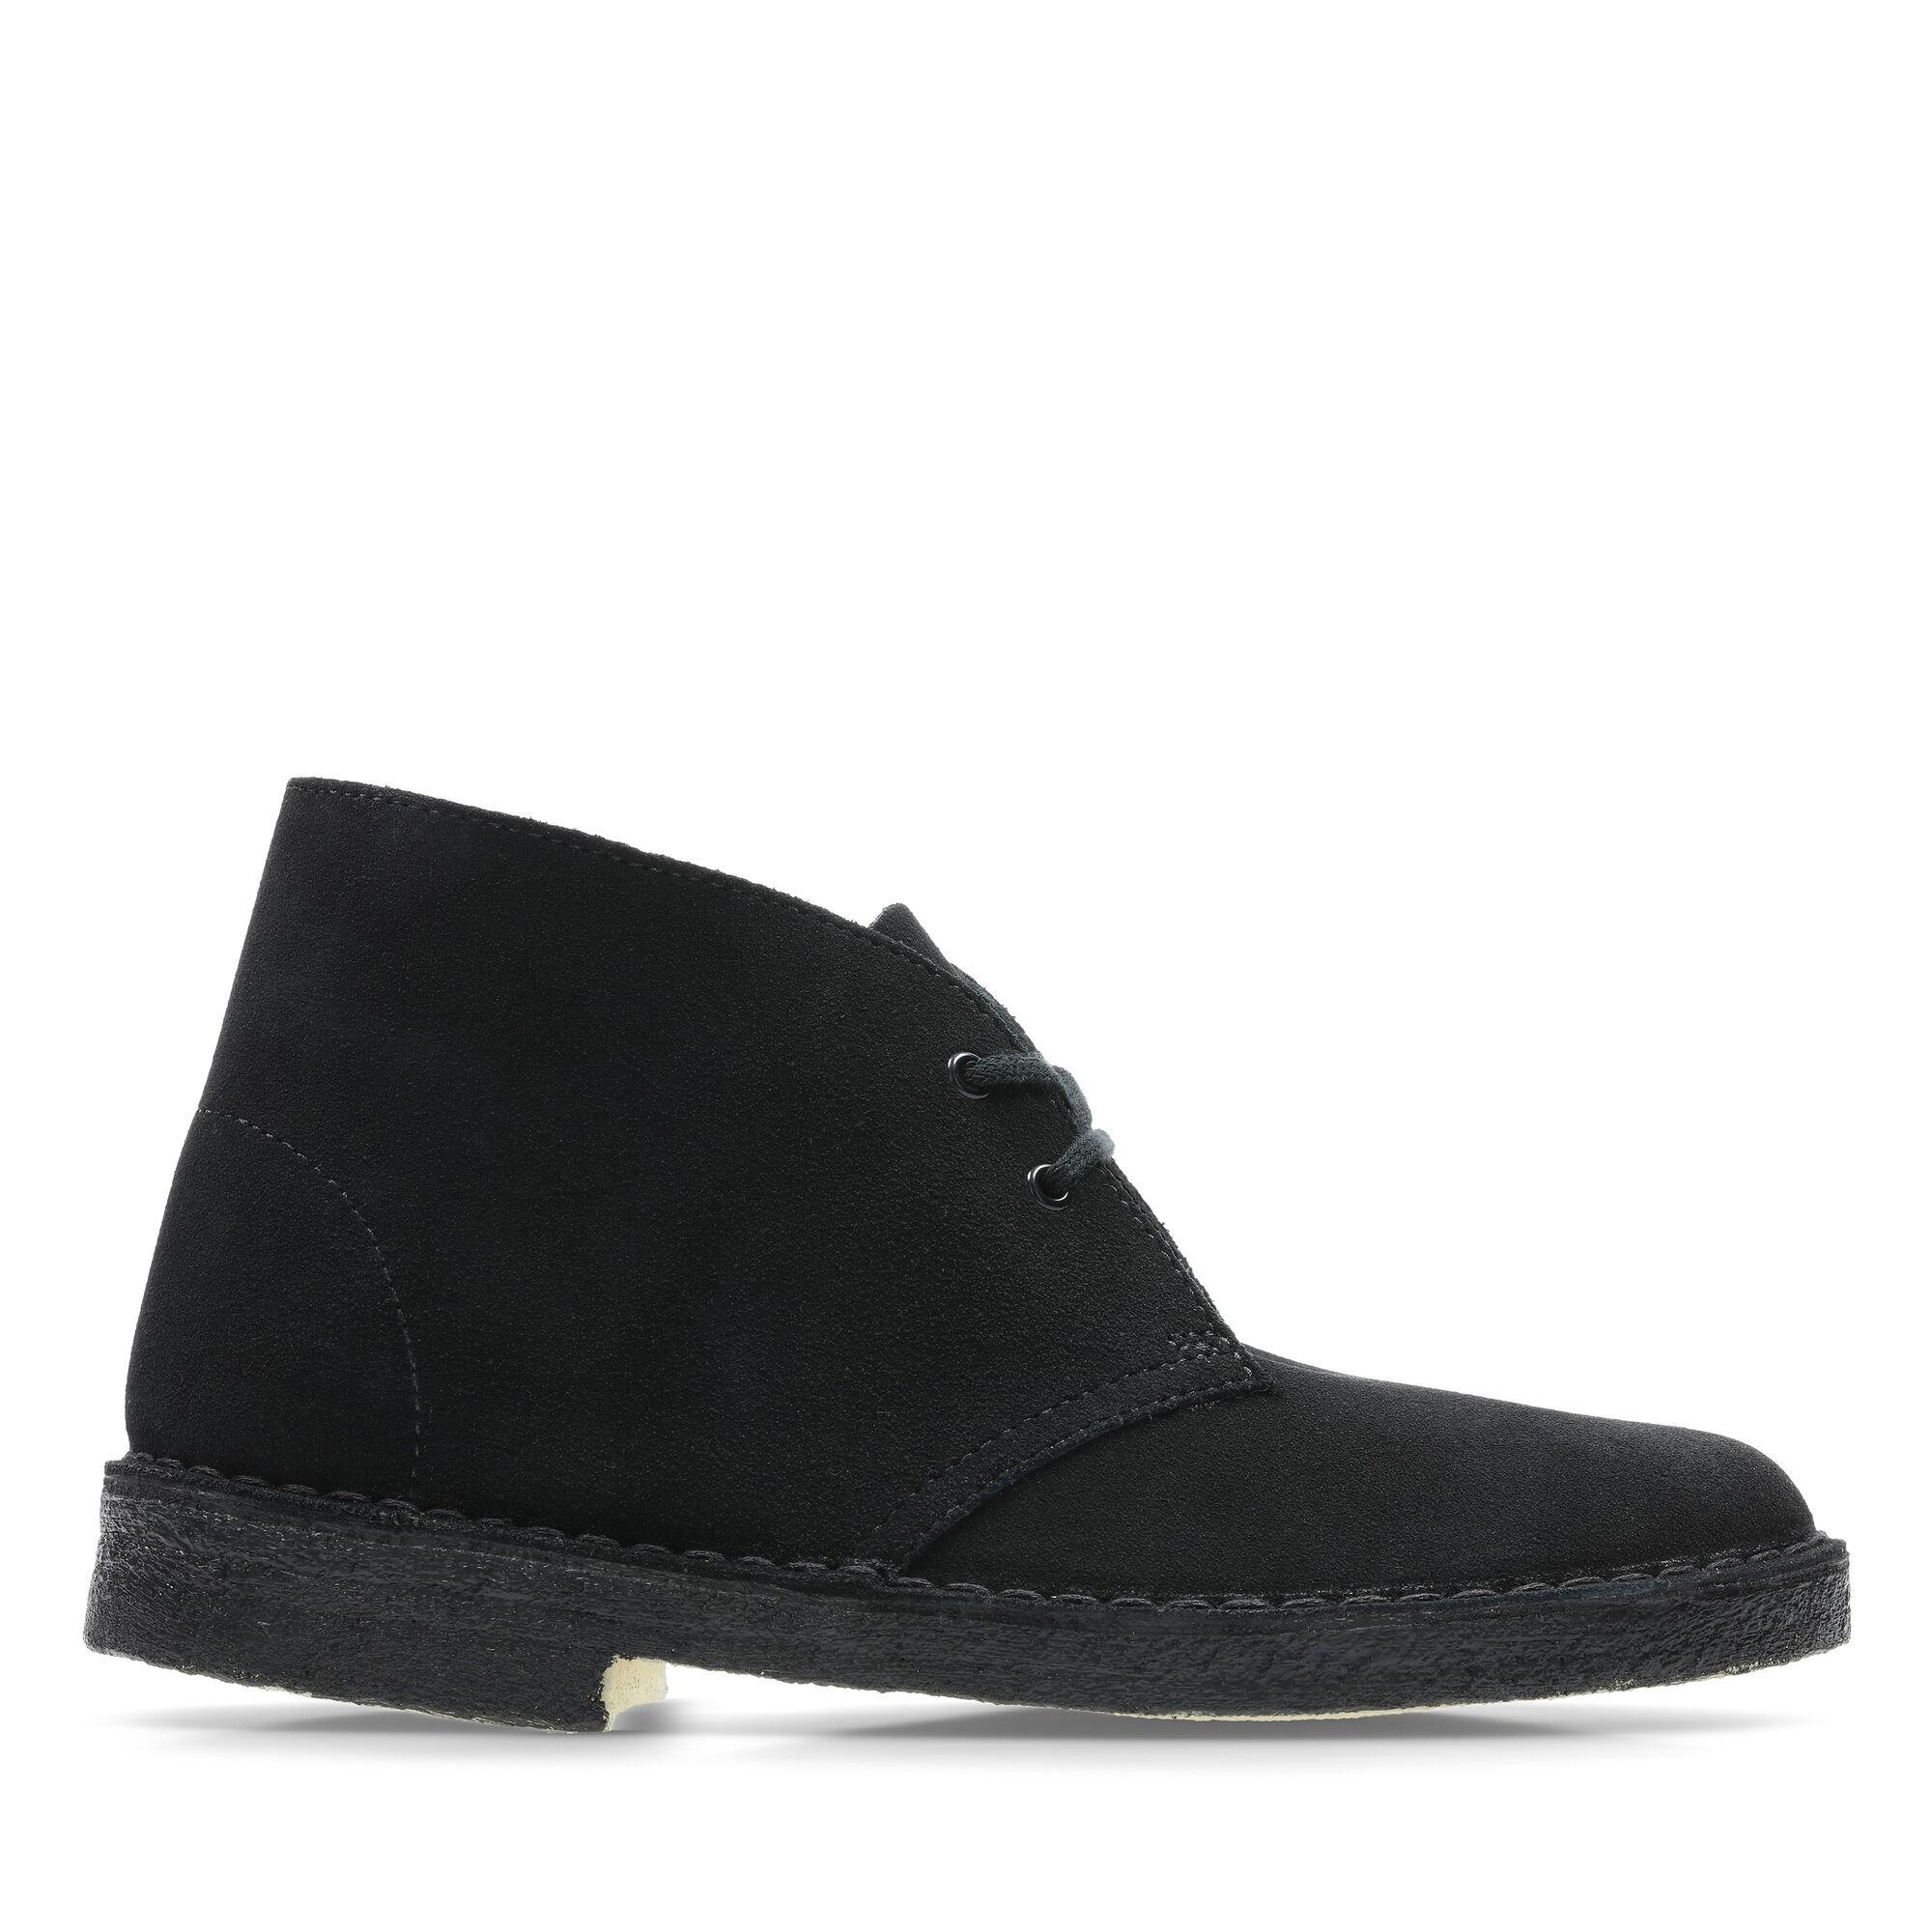 Suede Desert Boots - Desert Boot | Clarks